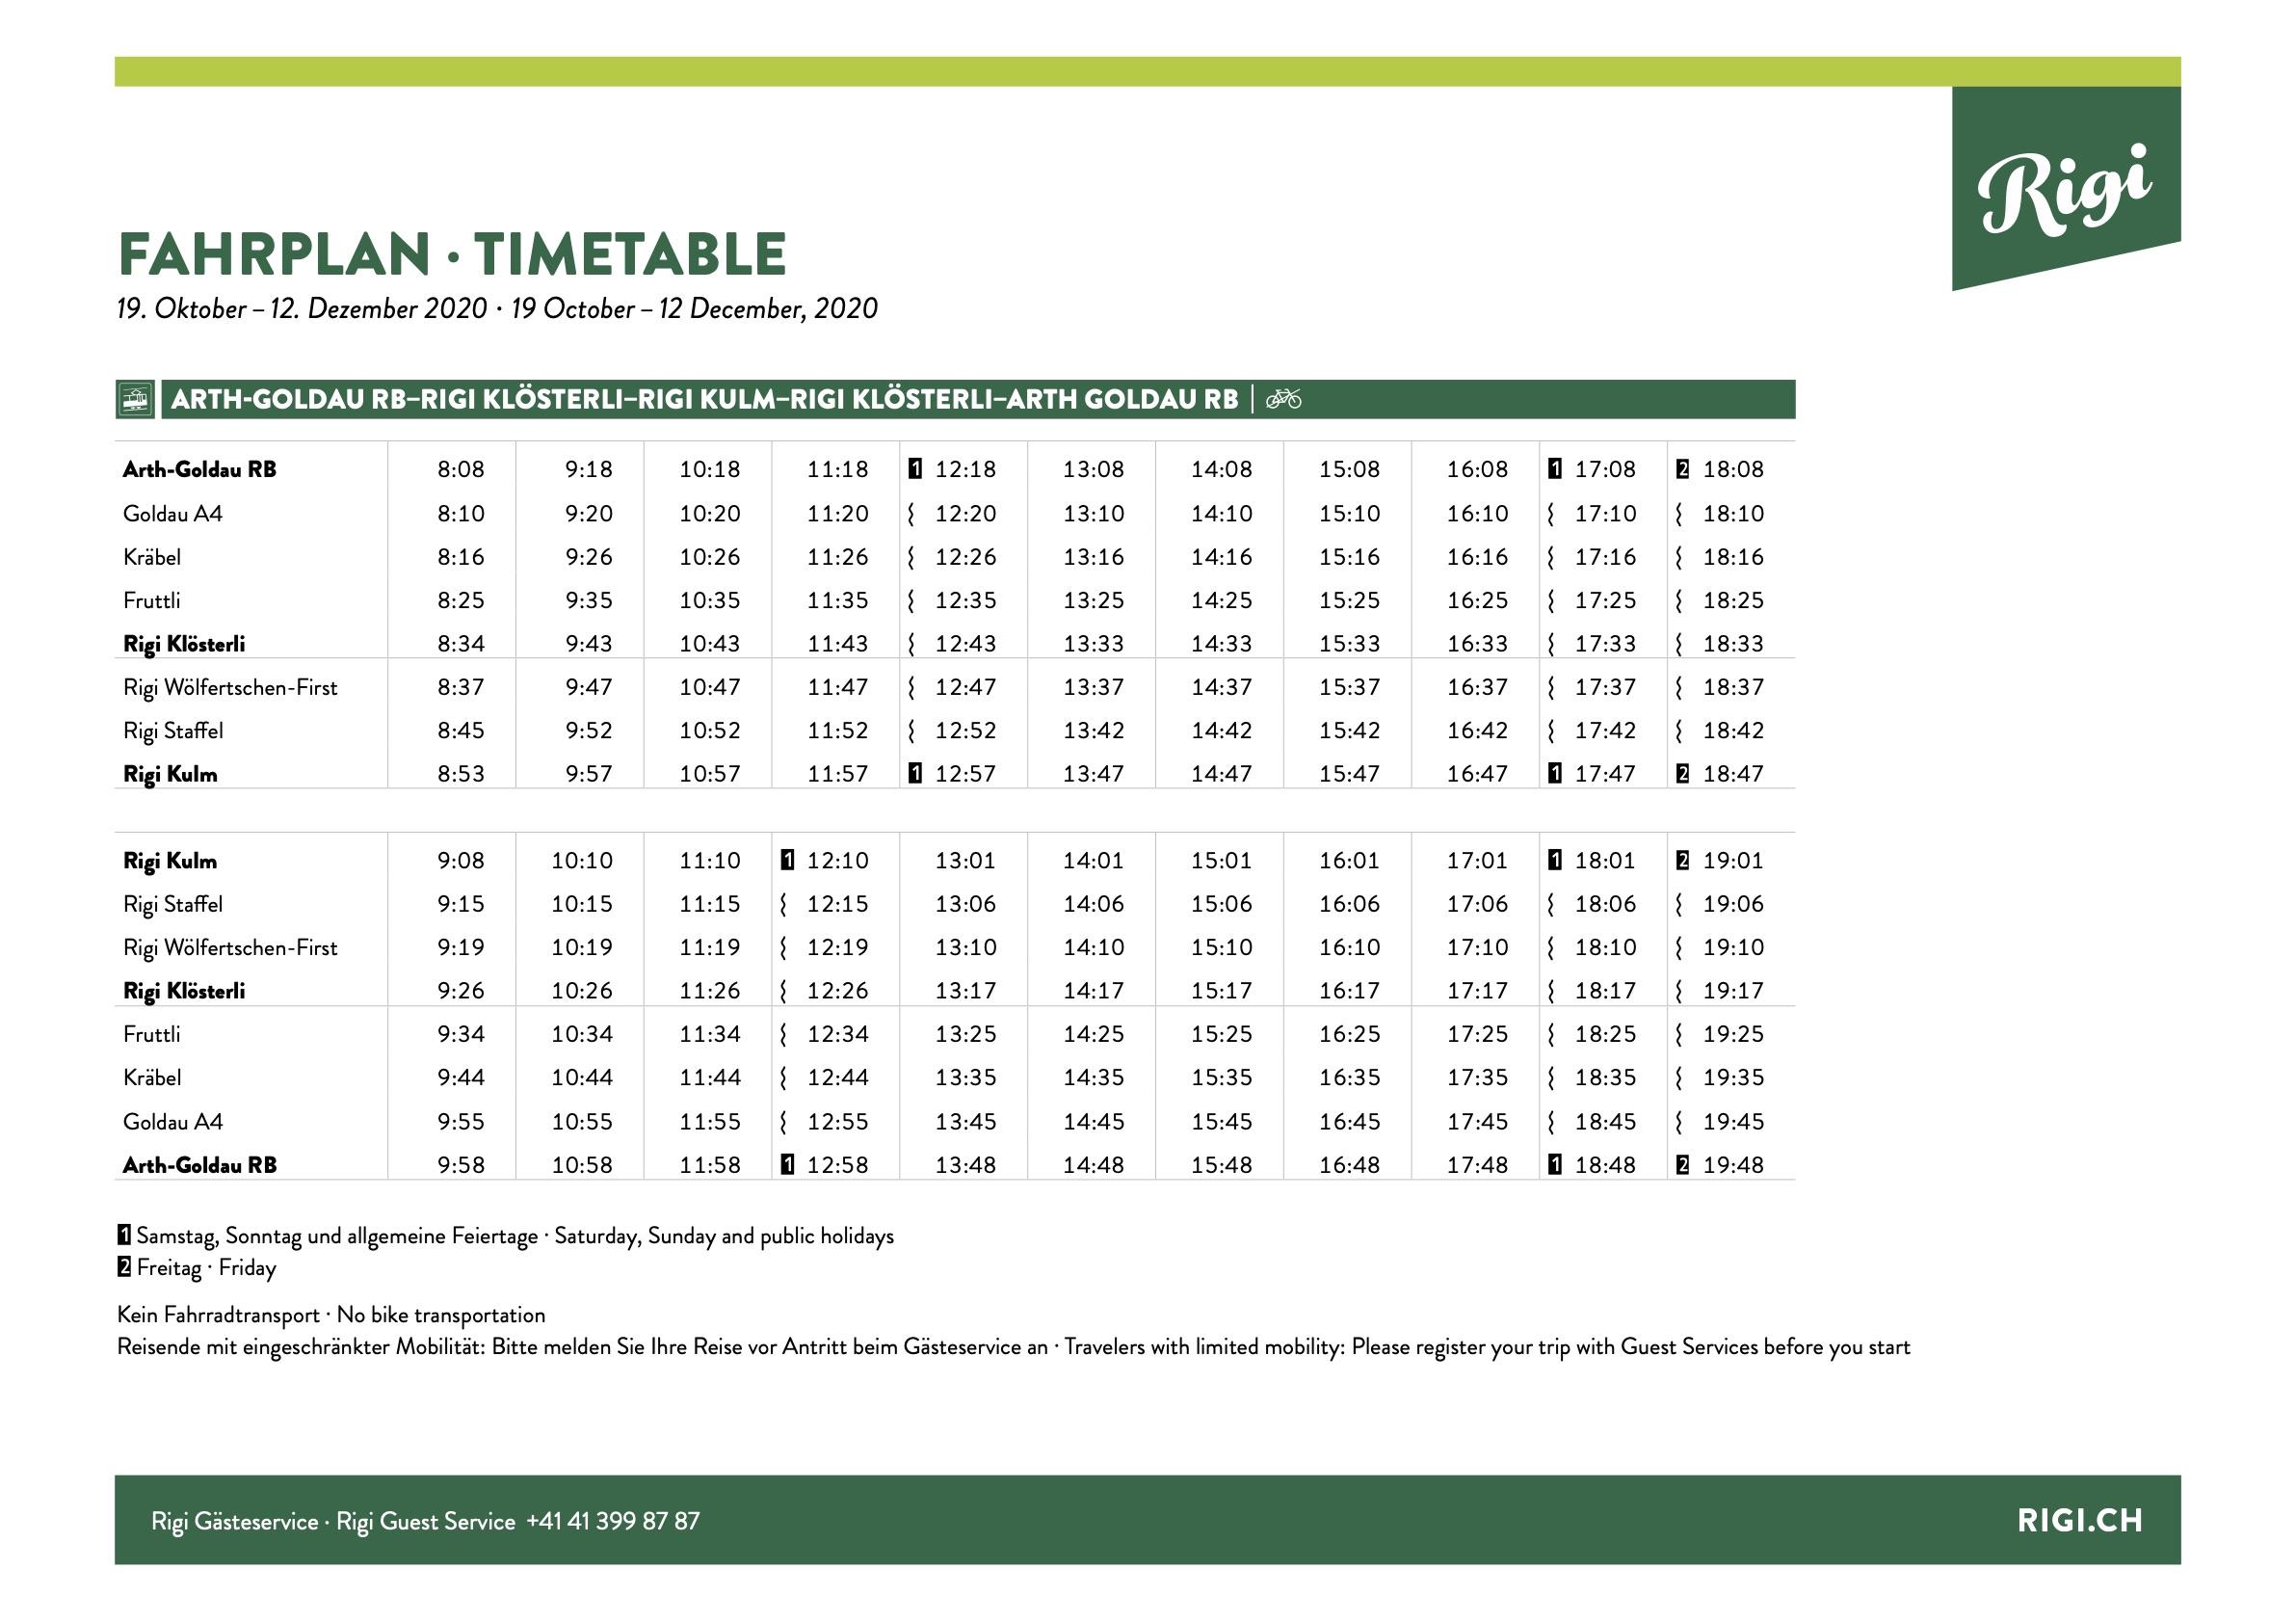 Fahrplan Zahnradbahn / Timetable cogwheel train Arth-Goldau - Rigi Kulm